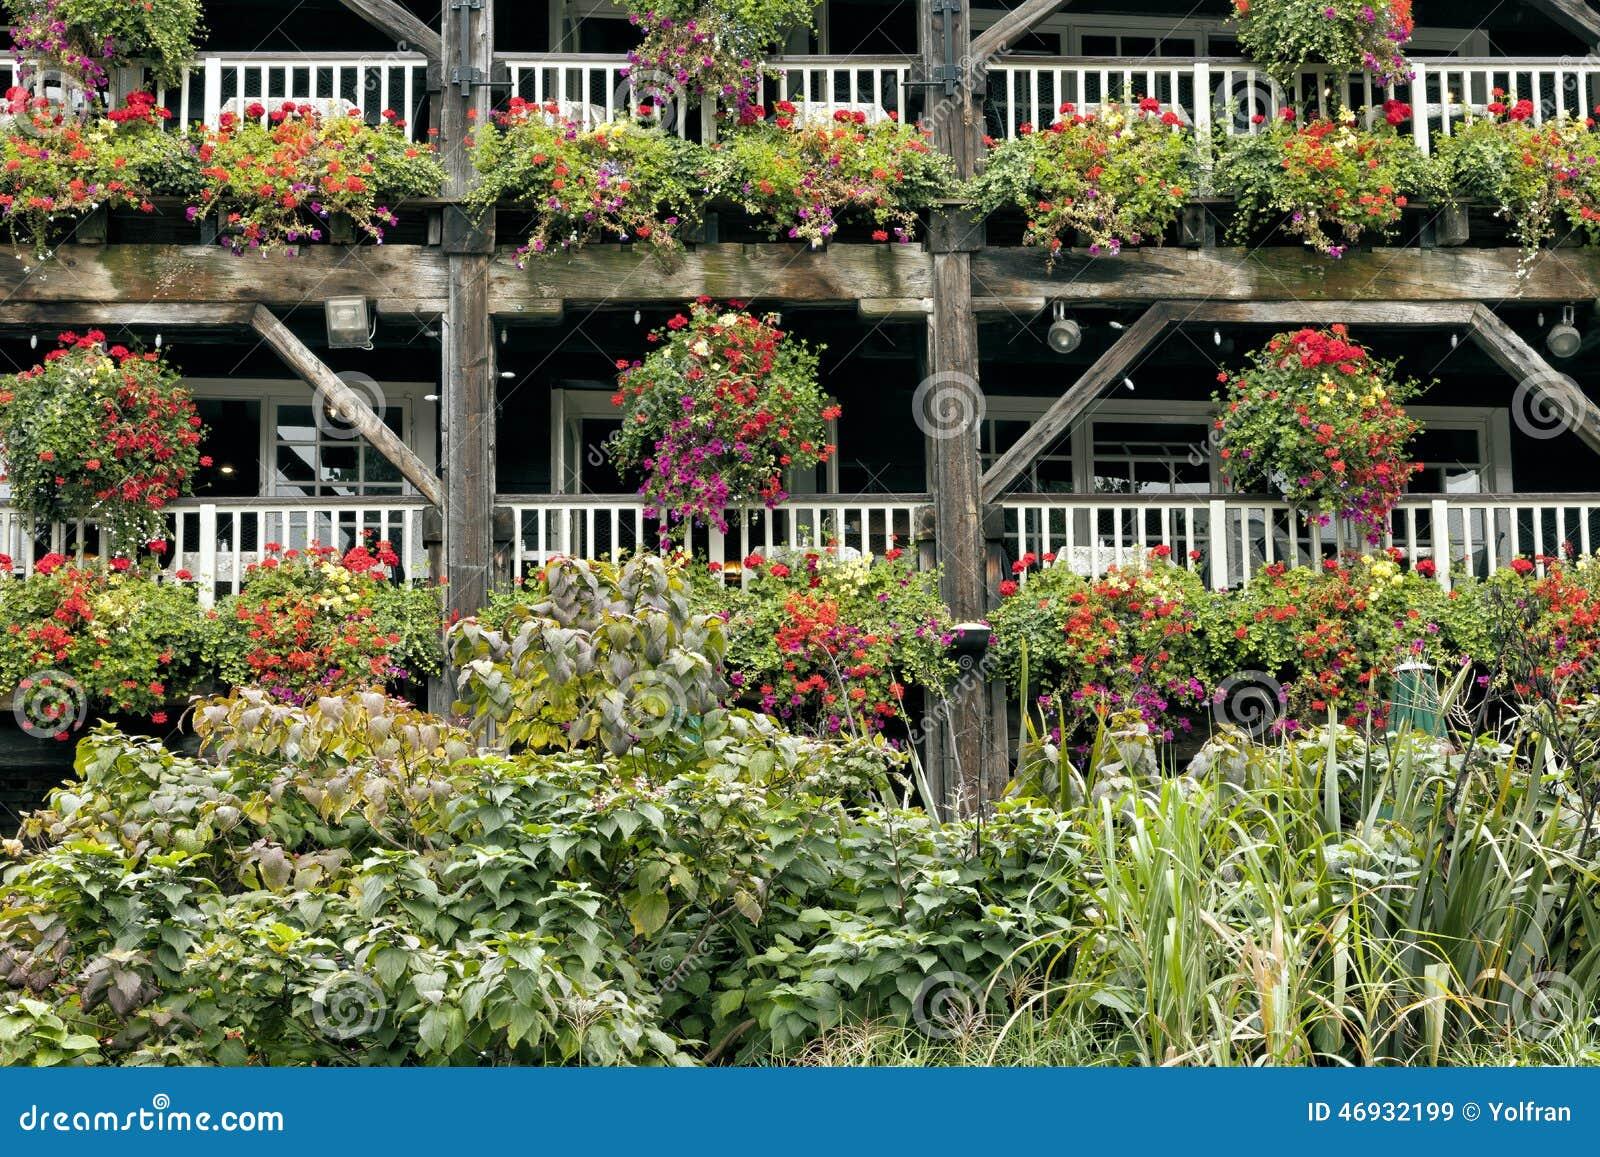 bunte blumen in h ngenden k rben auf balkonen stockfoto. Black Bedroom Furniture Sets. Home Design Ideas